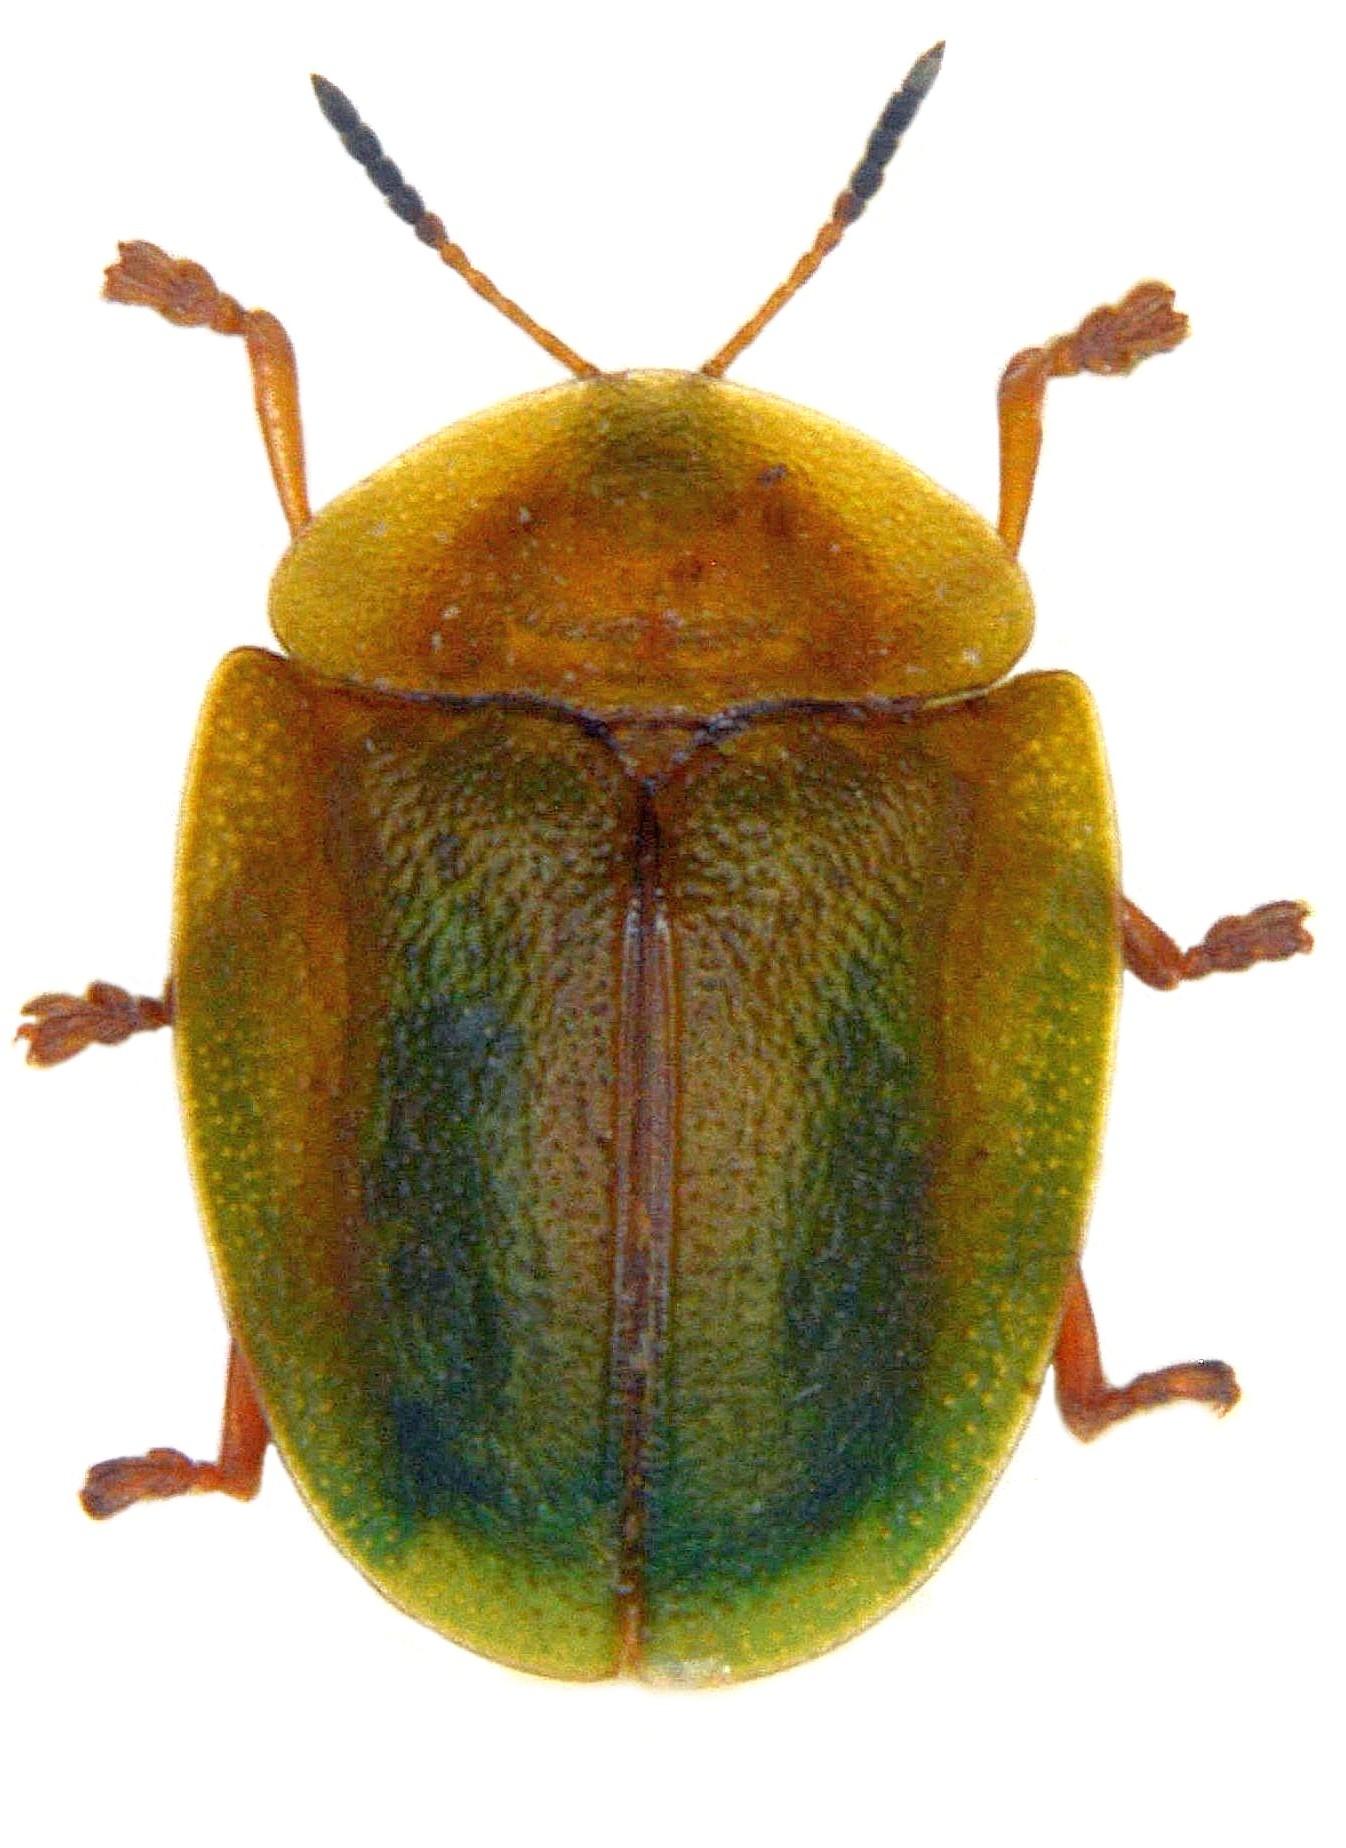 Cassida viridis